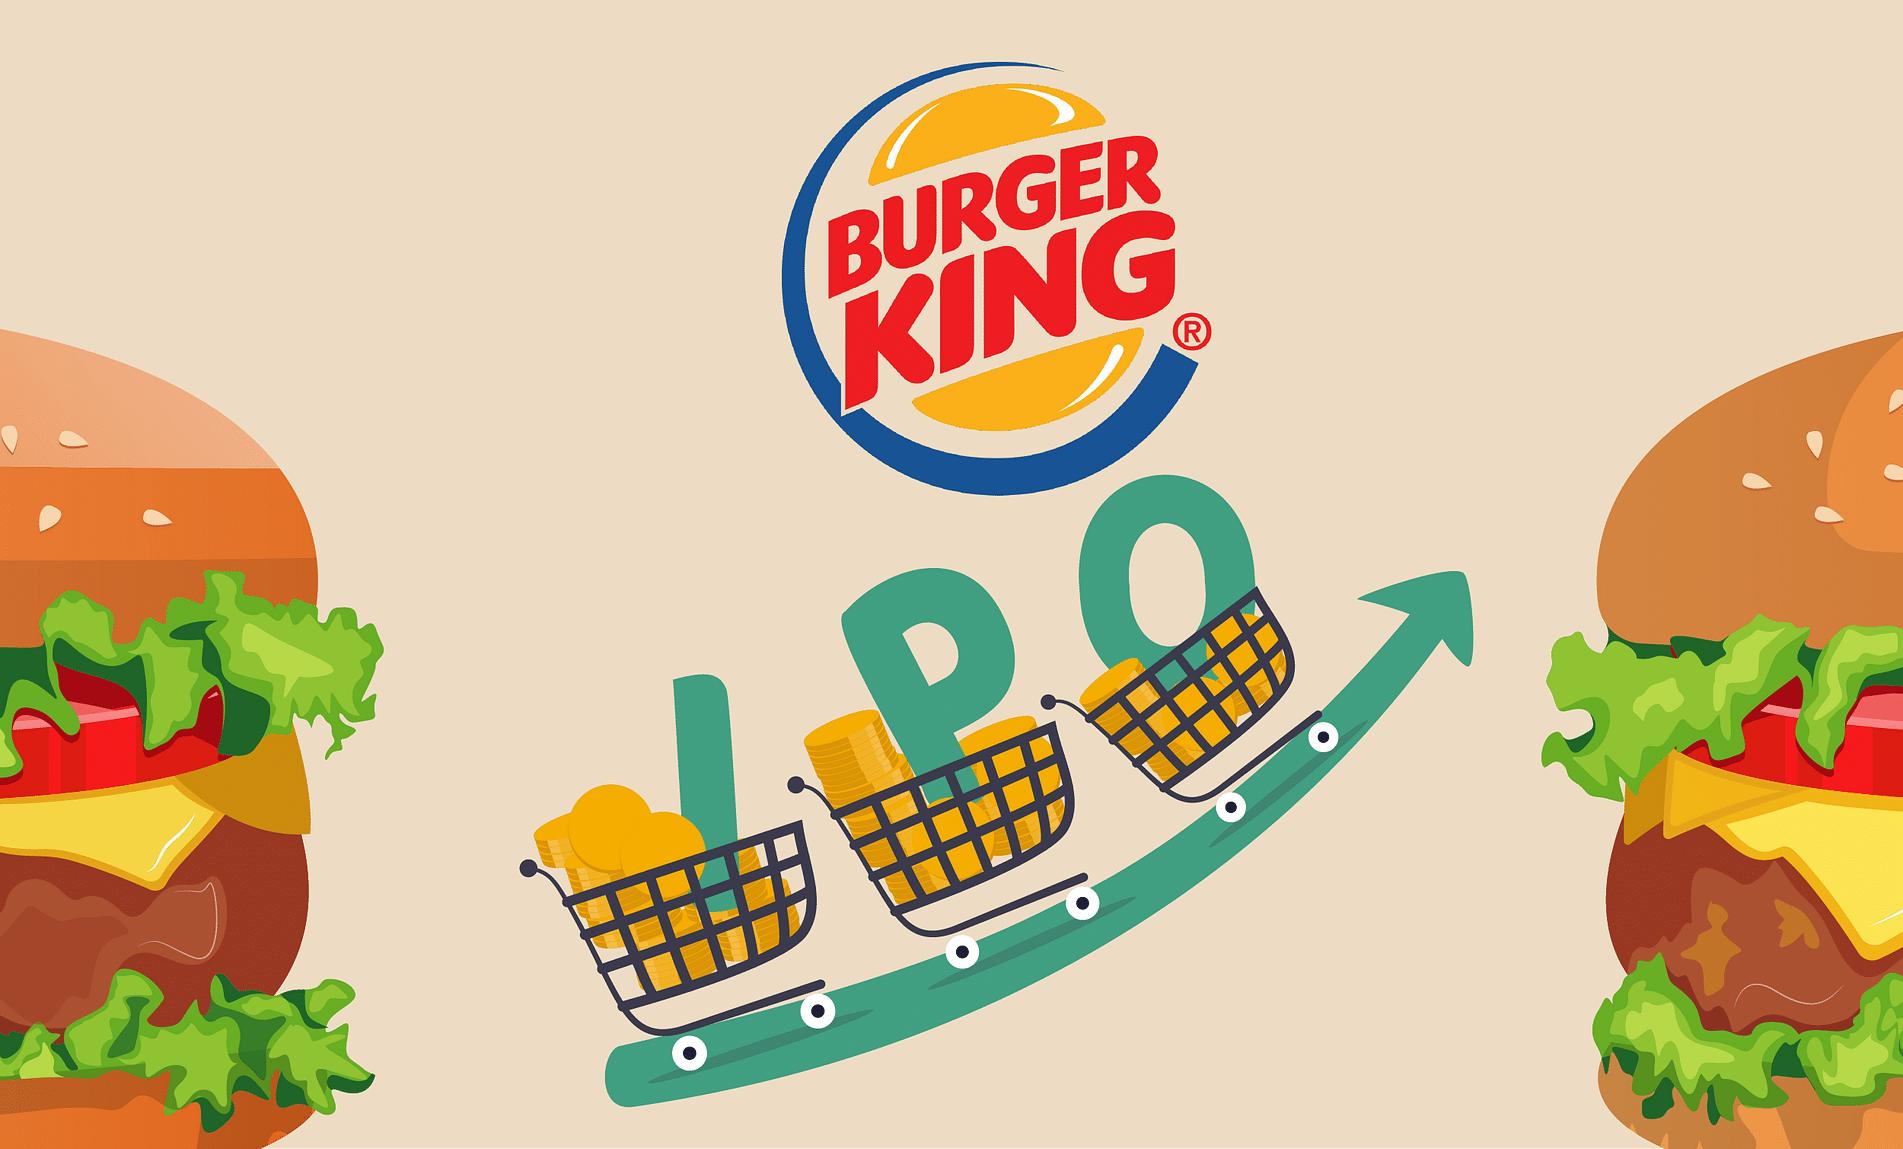 Burger King's successful IPO